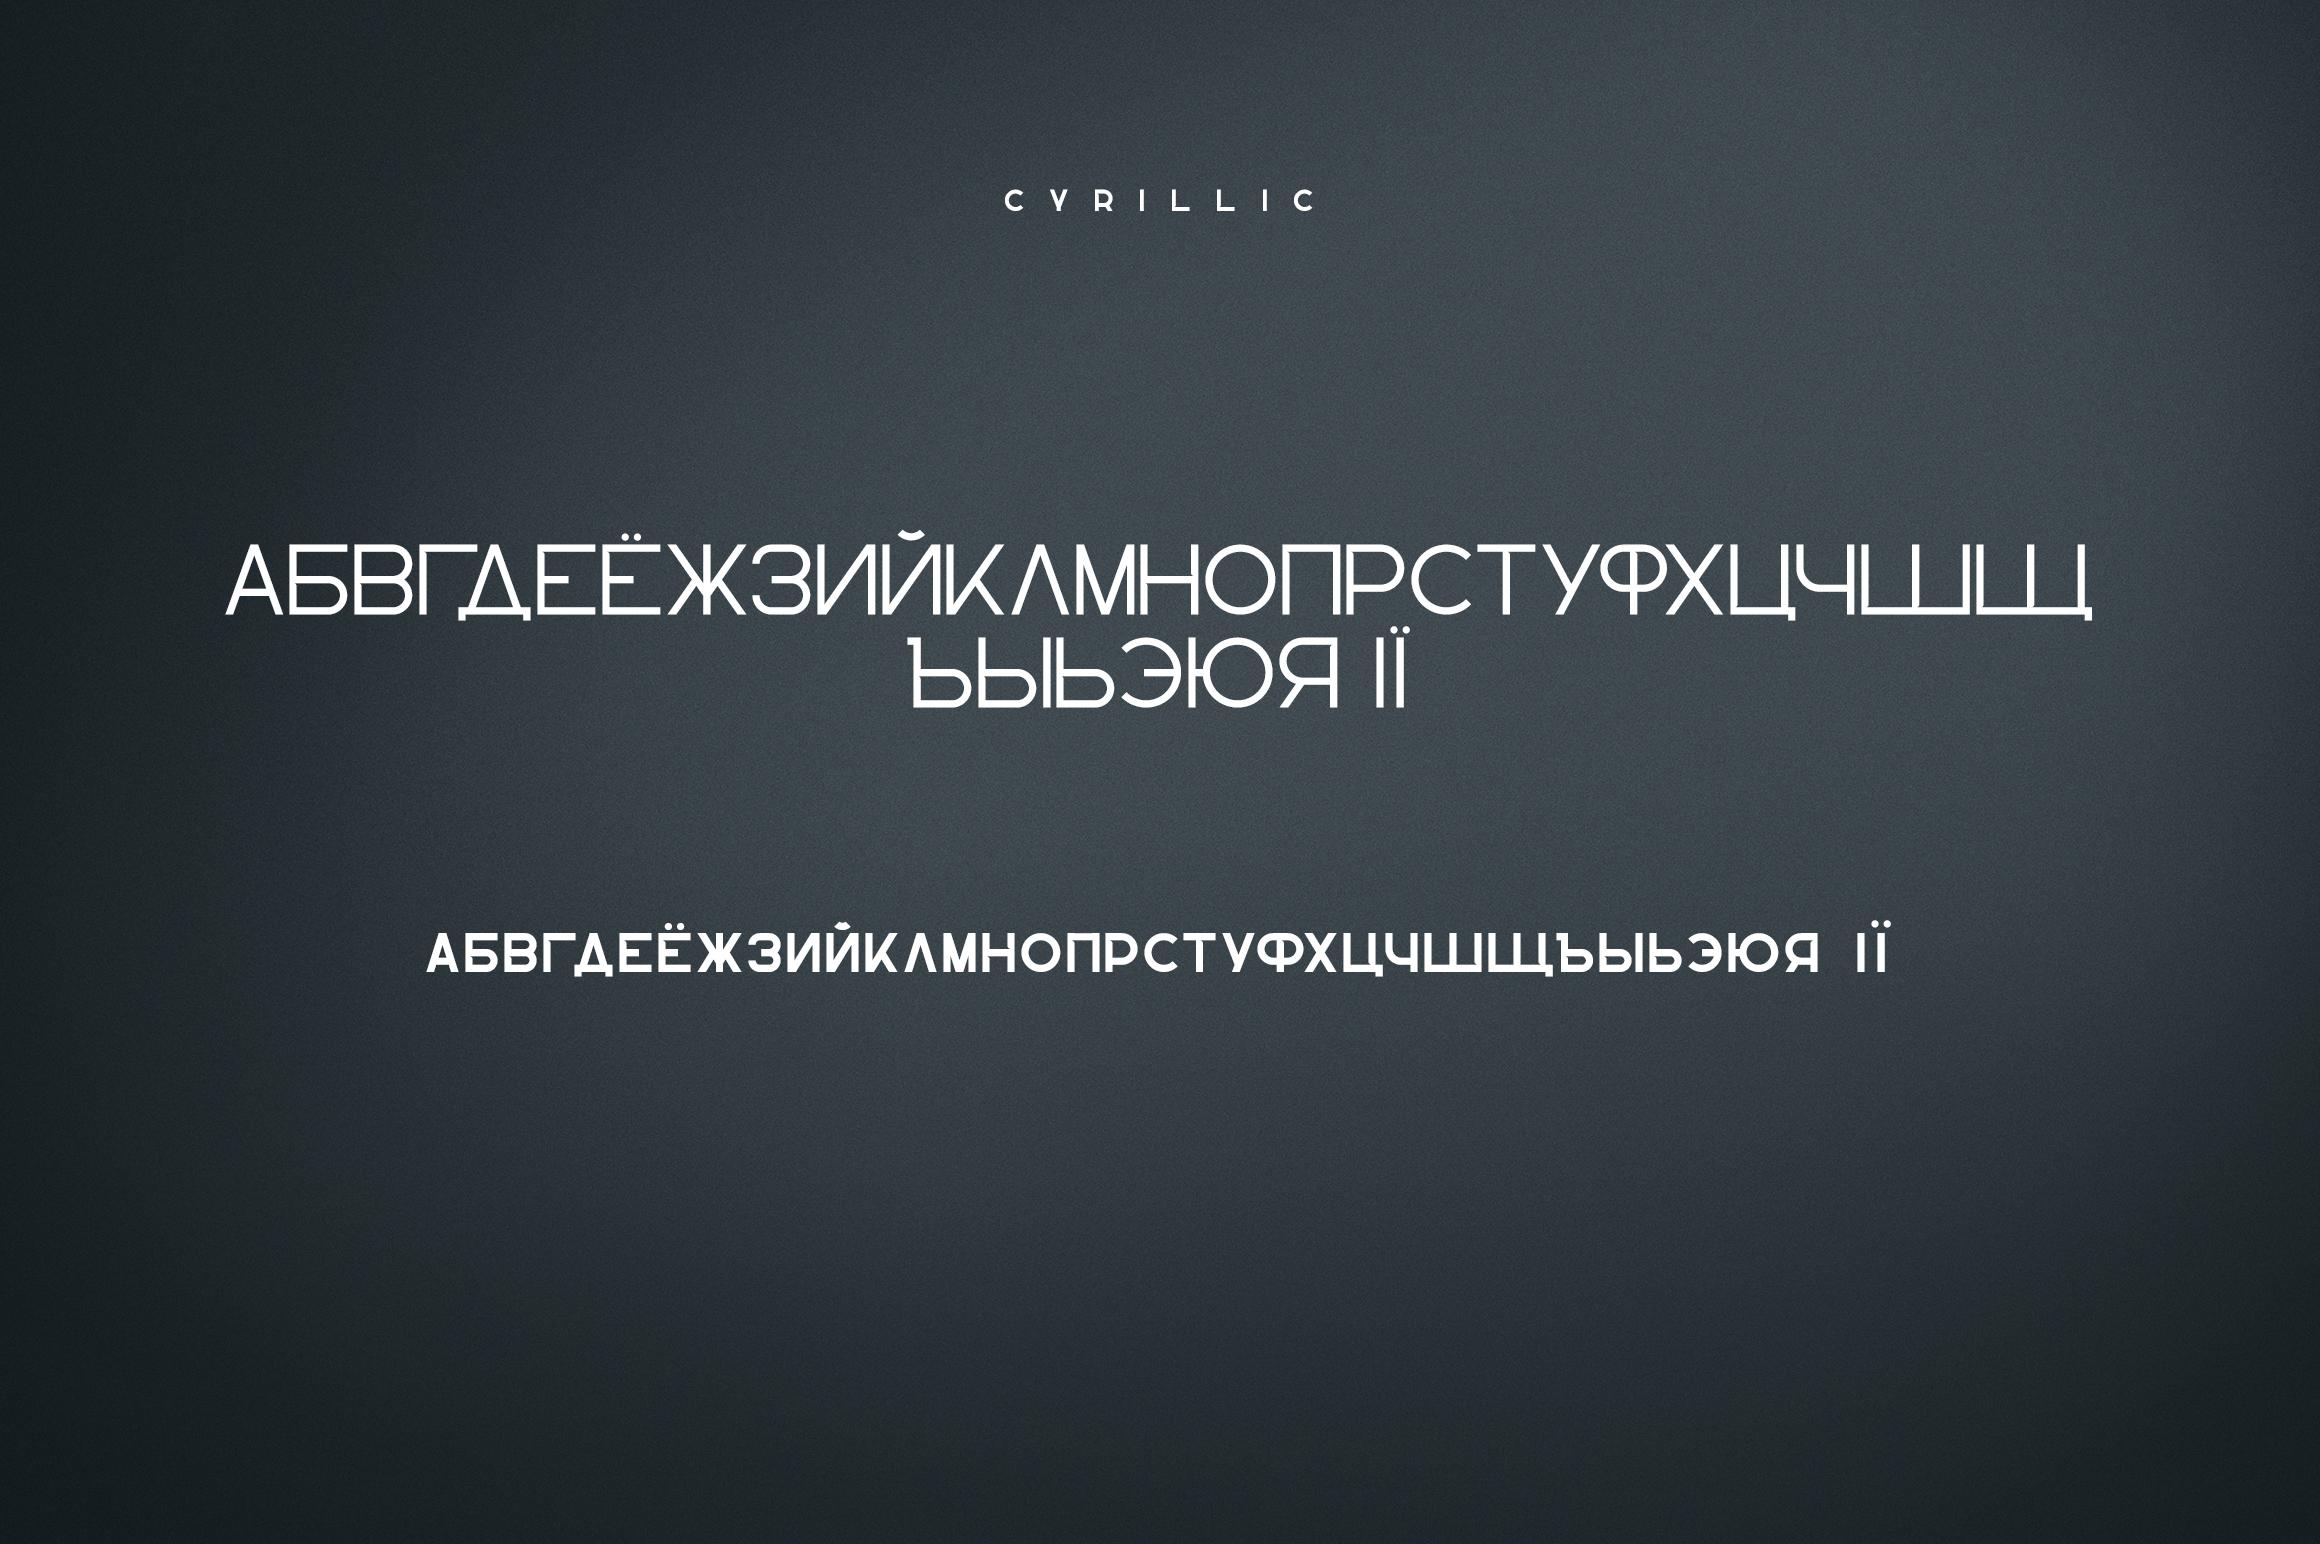 Lotus Eater - sans serif font example image 8